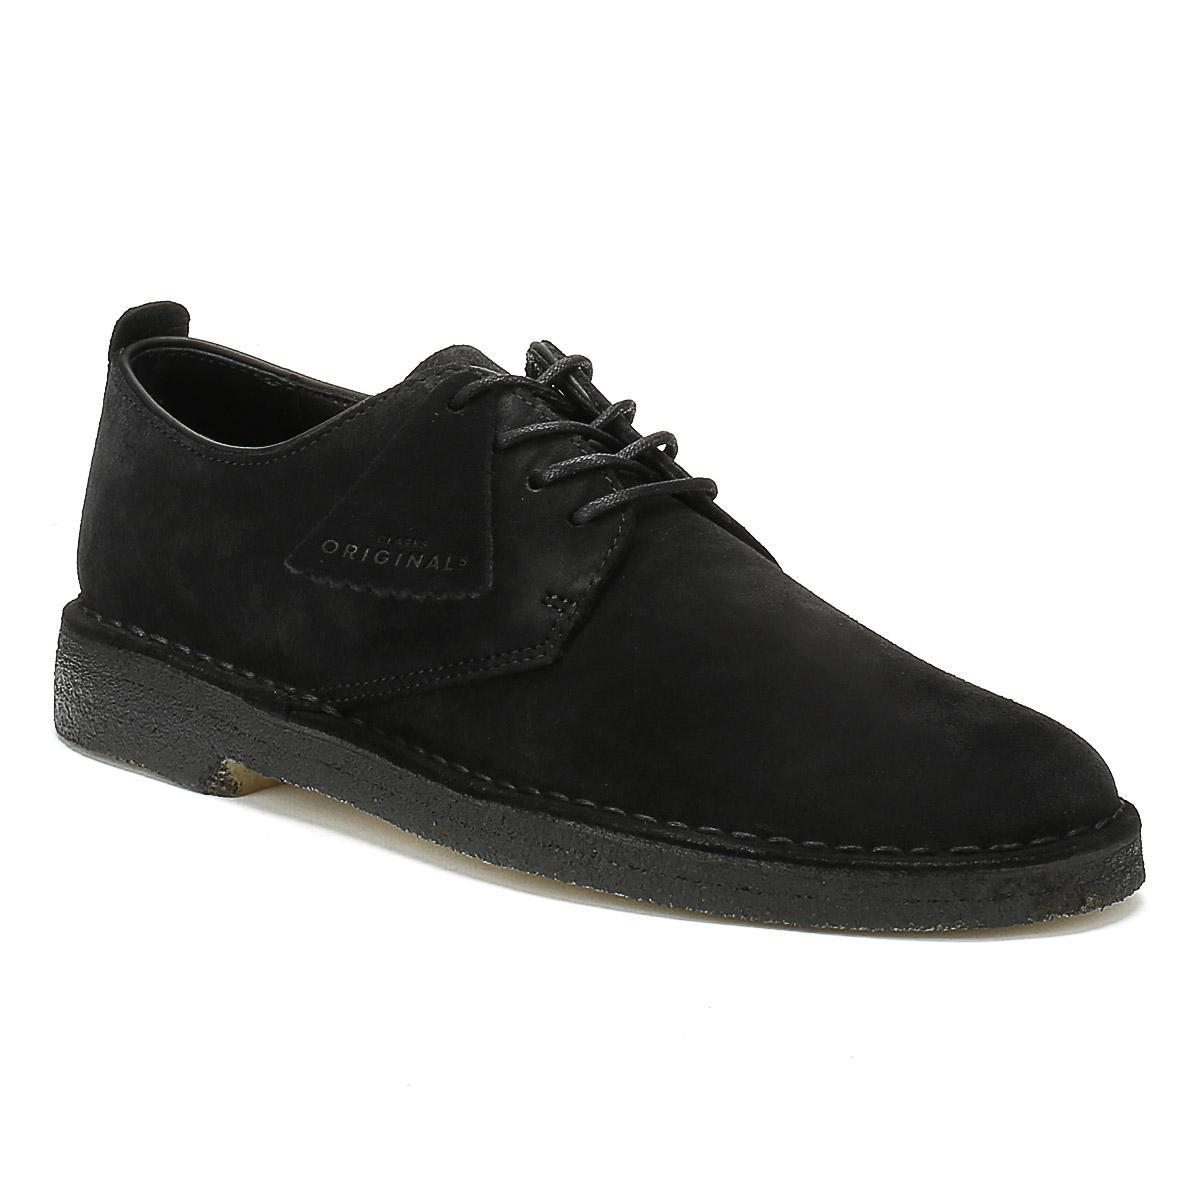 Desert London Suede Shoes - Black Clarks bvzZ8OSMfK